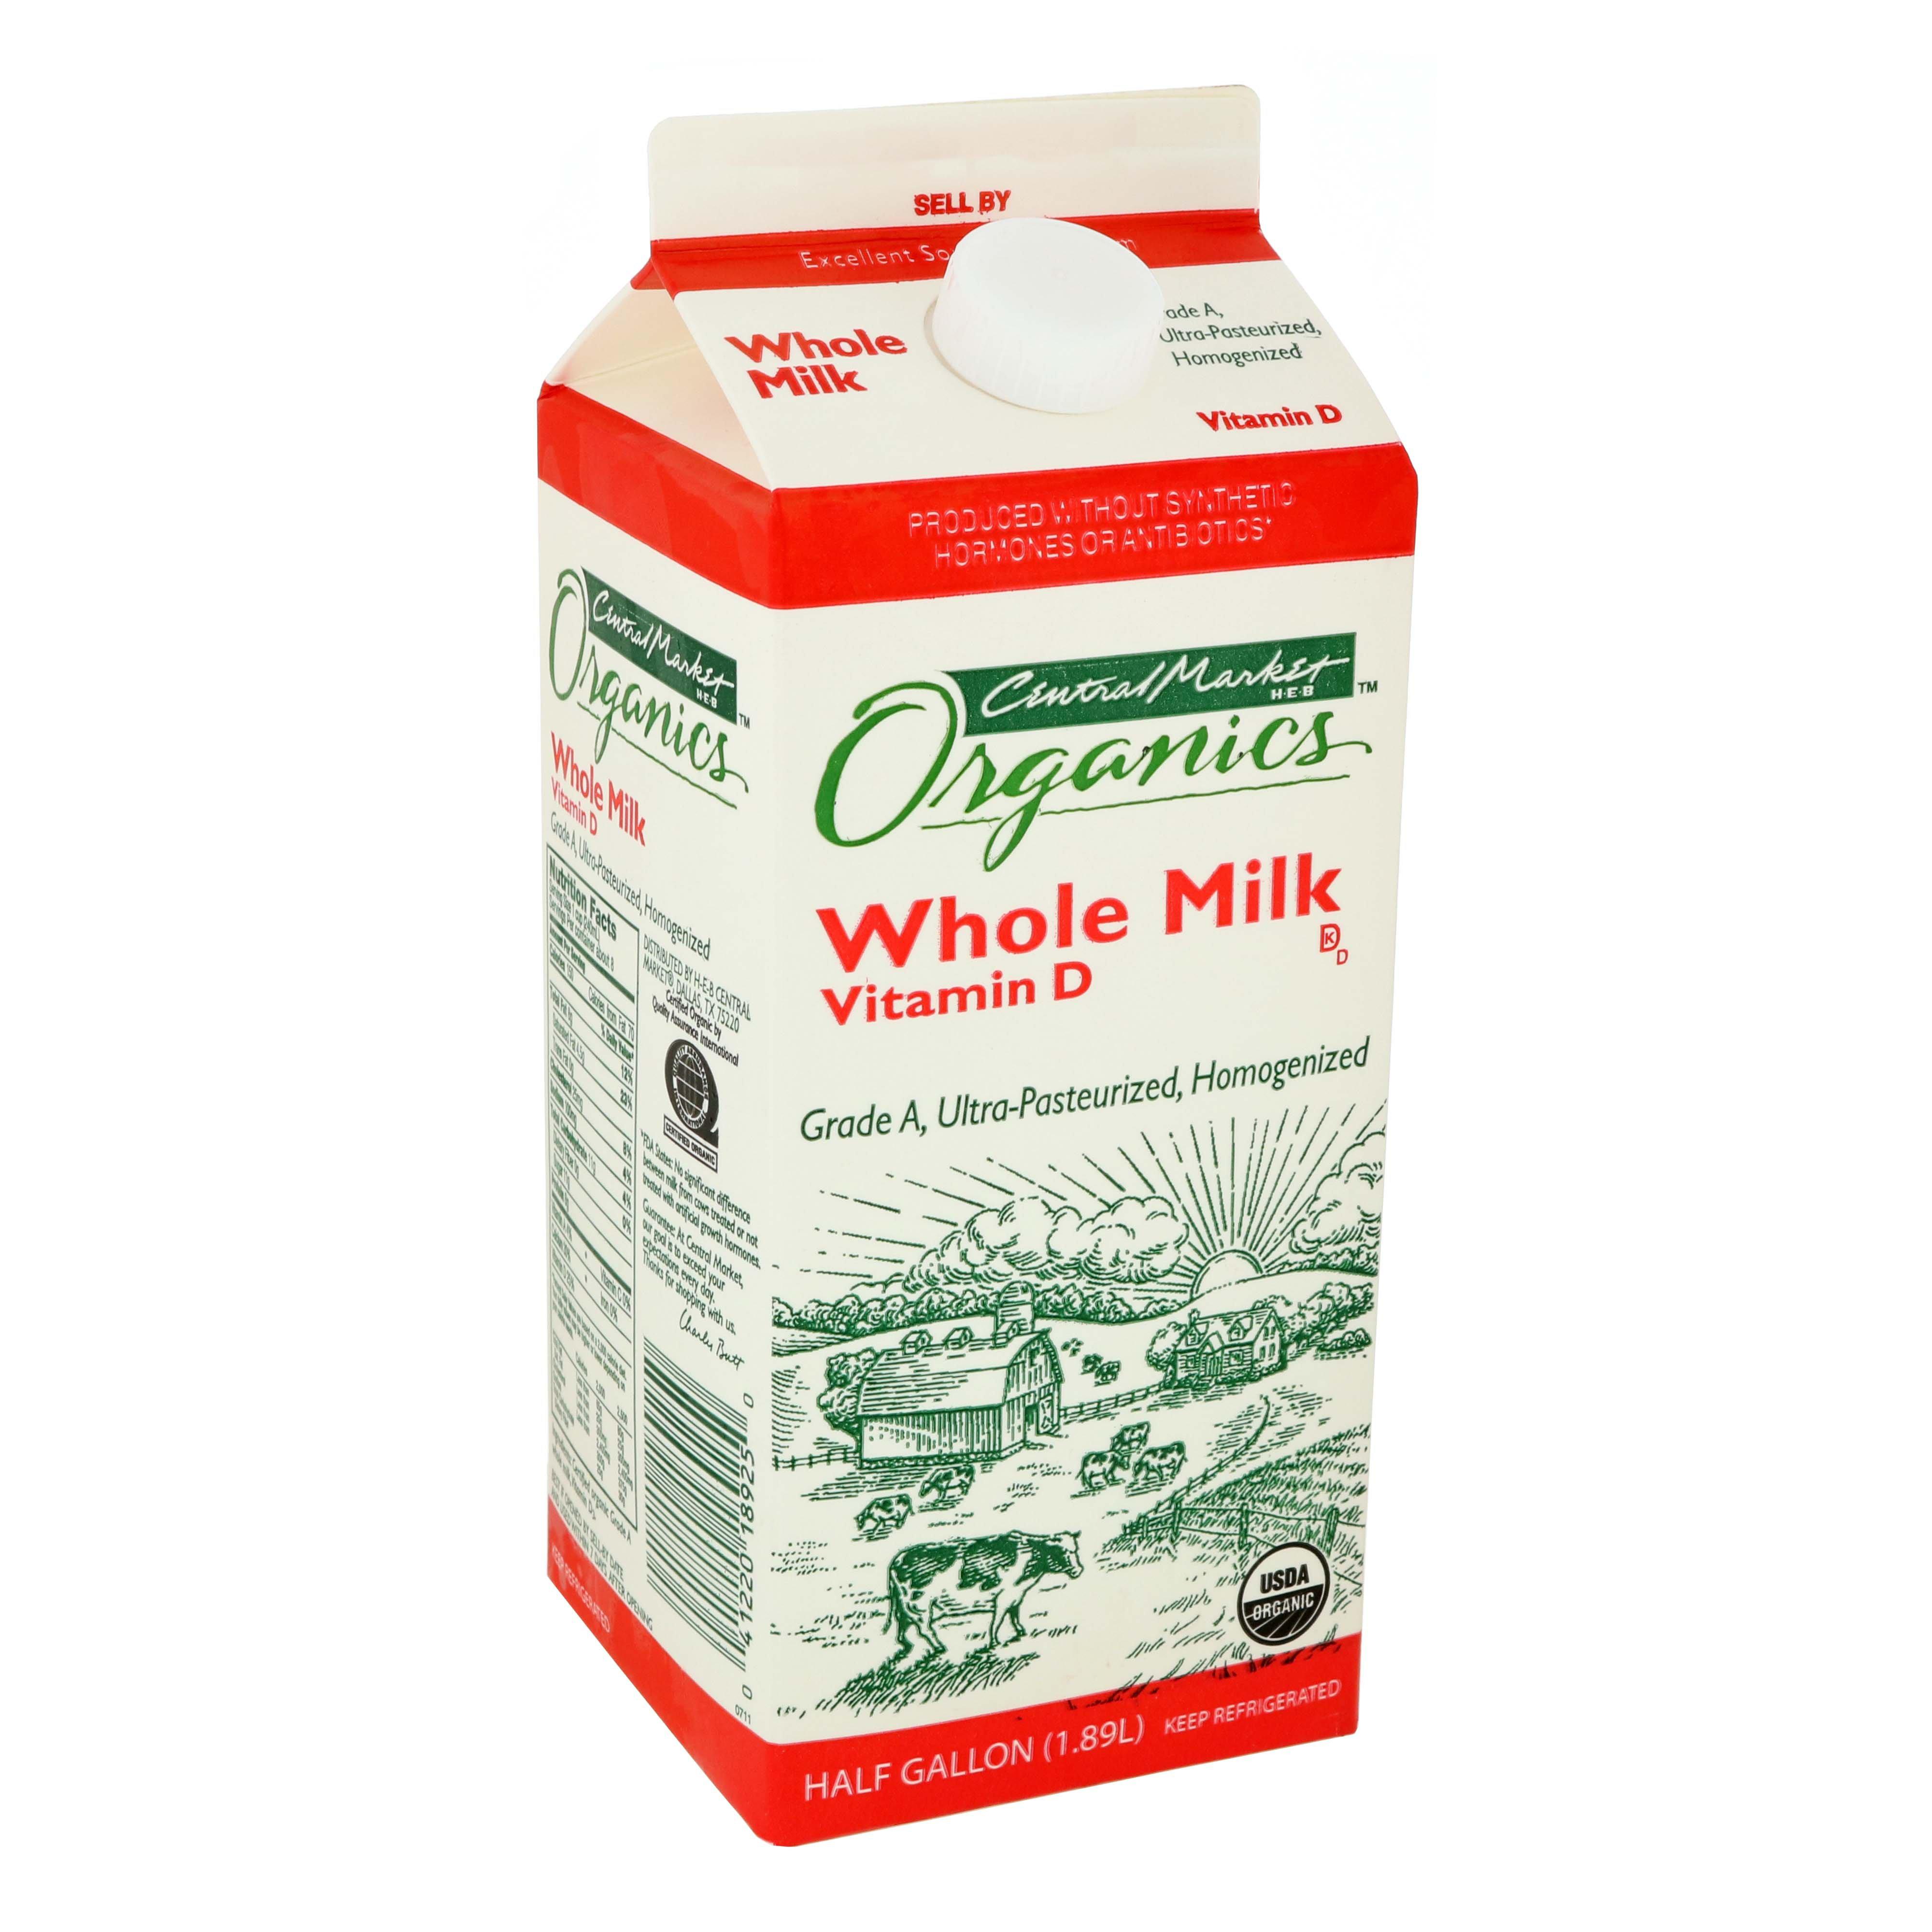 Central Market Organics Whole Milk Shop Milk At H E B